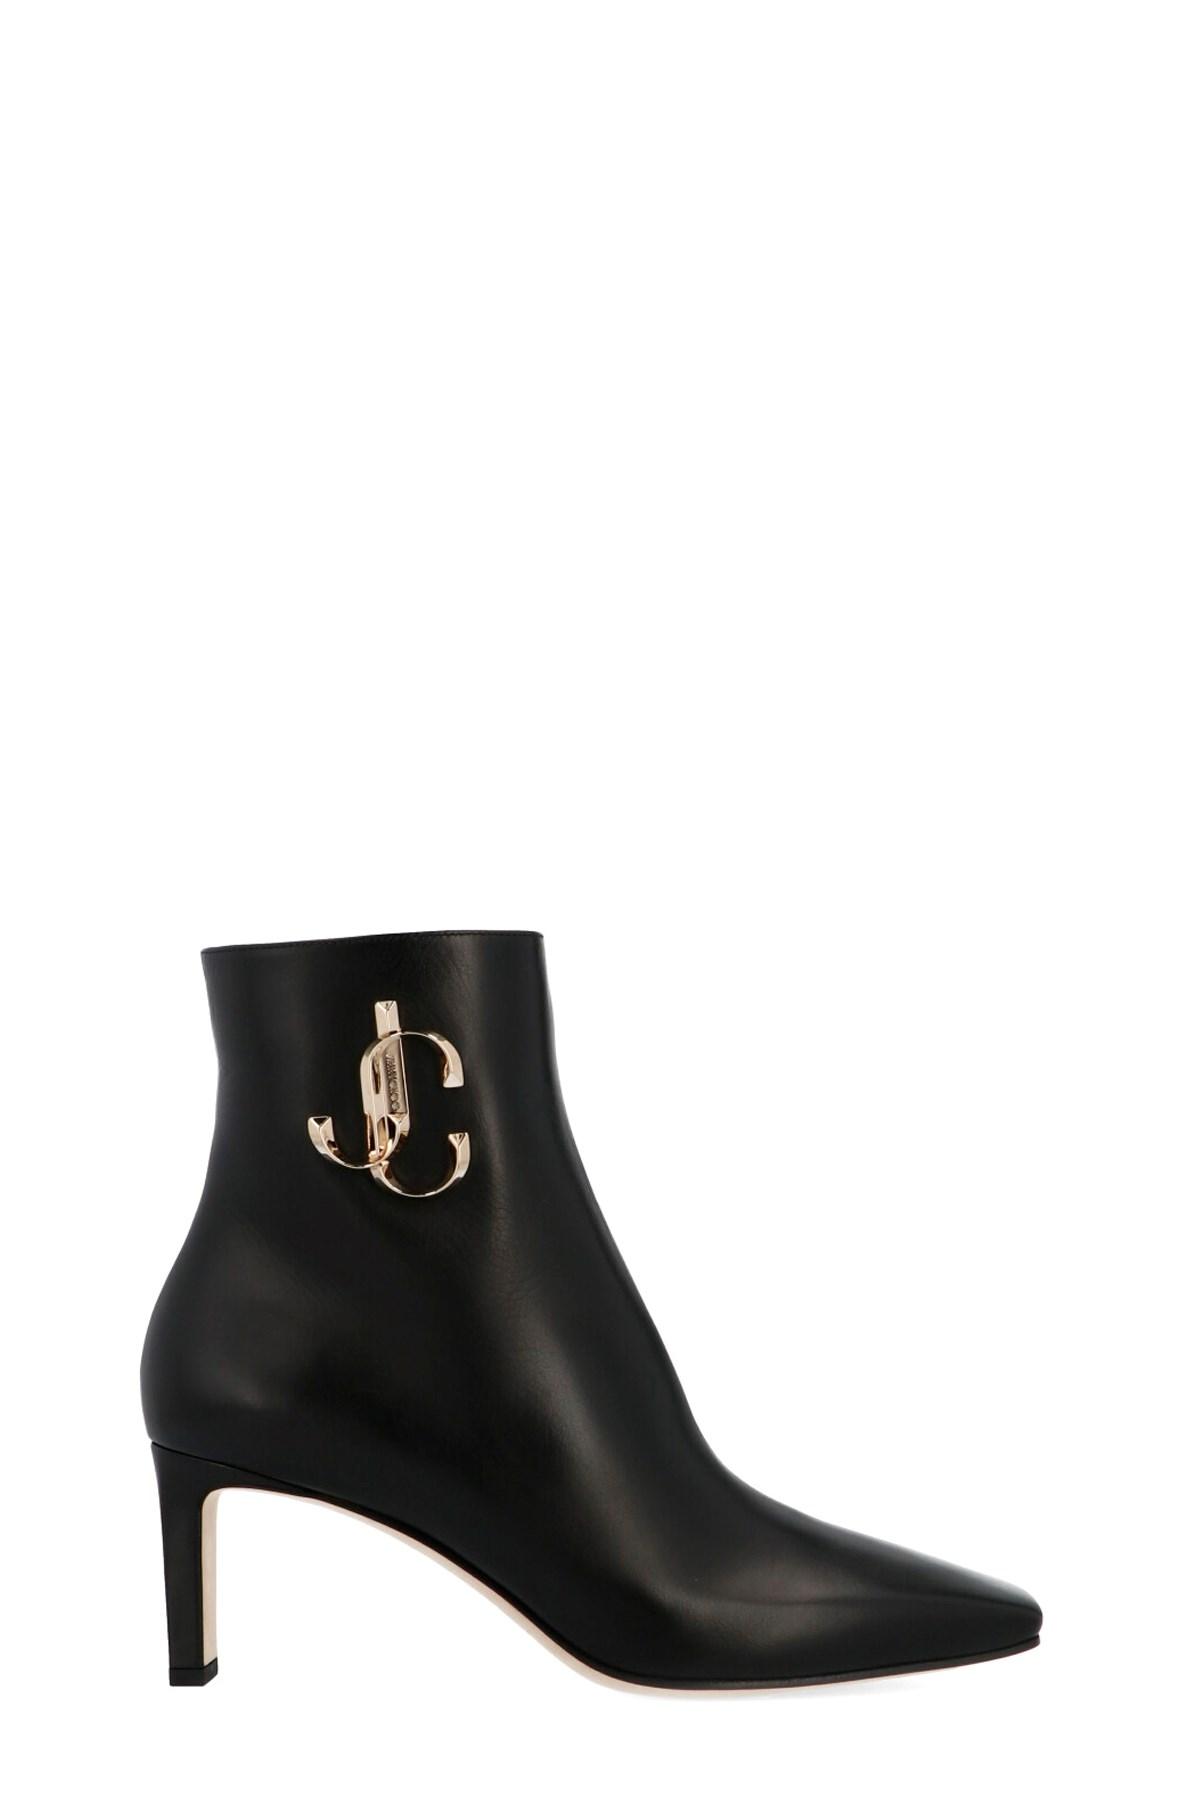 jimmy choo 'Minori' ankle boots